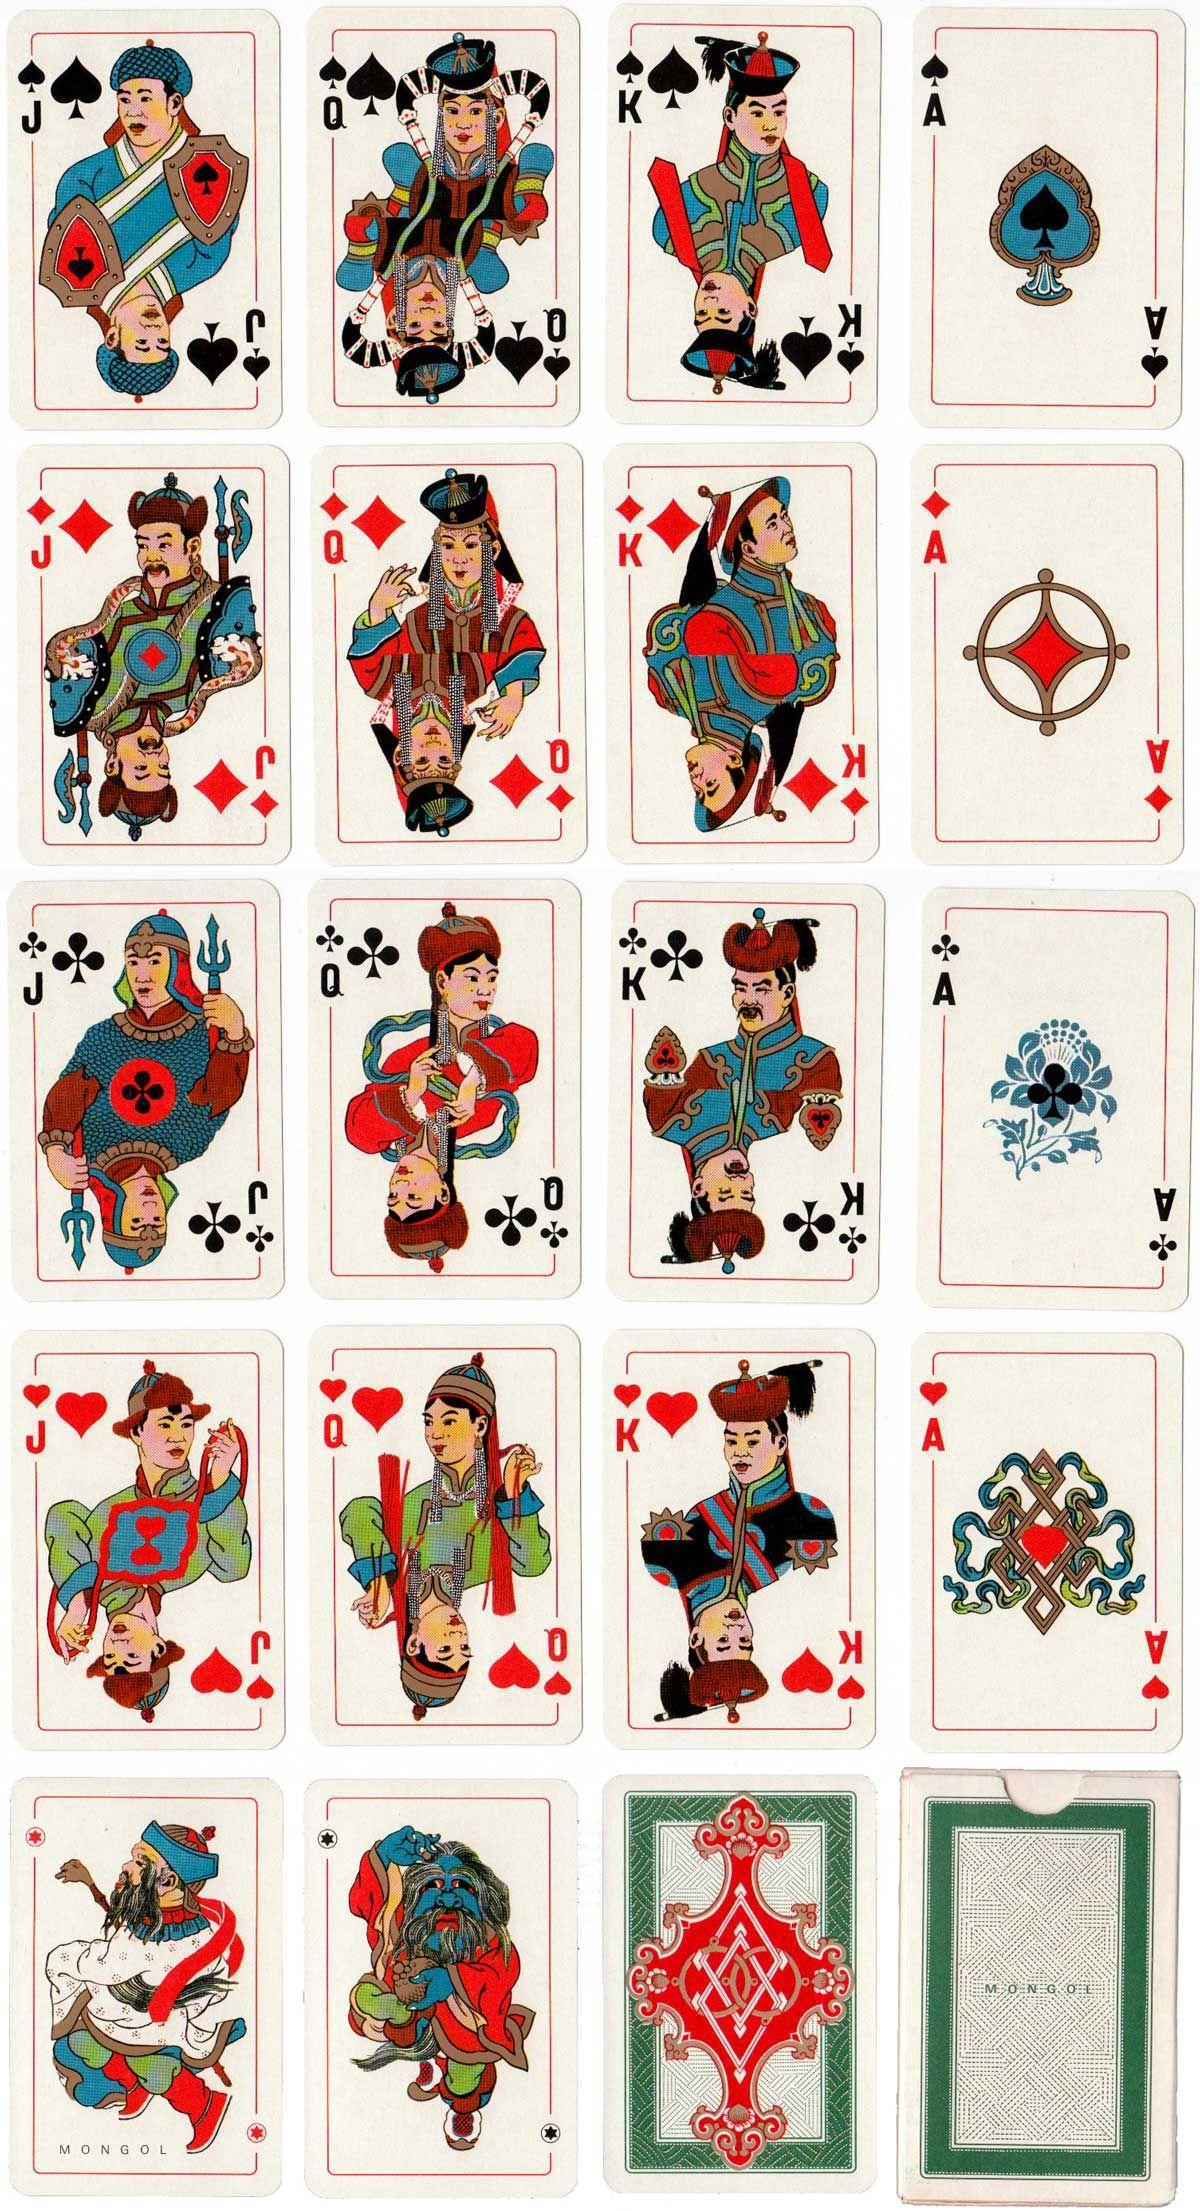 Mongol Playing Cards made by Piatnik & Söhne AG, Wien, 1973 - poker playing cards, deck of cards, card deck, unique playing cards, art of play cards, design play cards, cool playing cards, cardistry, jugando a las cartas, karty do gry, игральные карты, карты